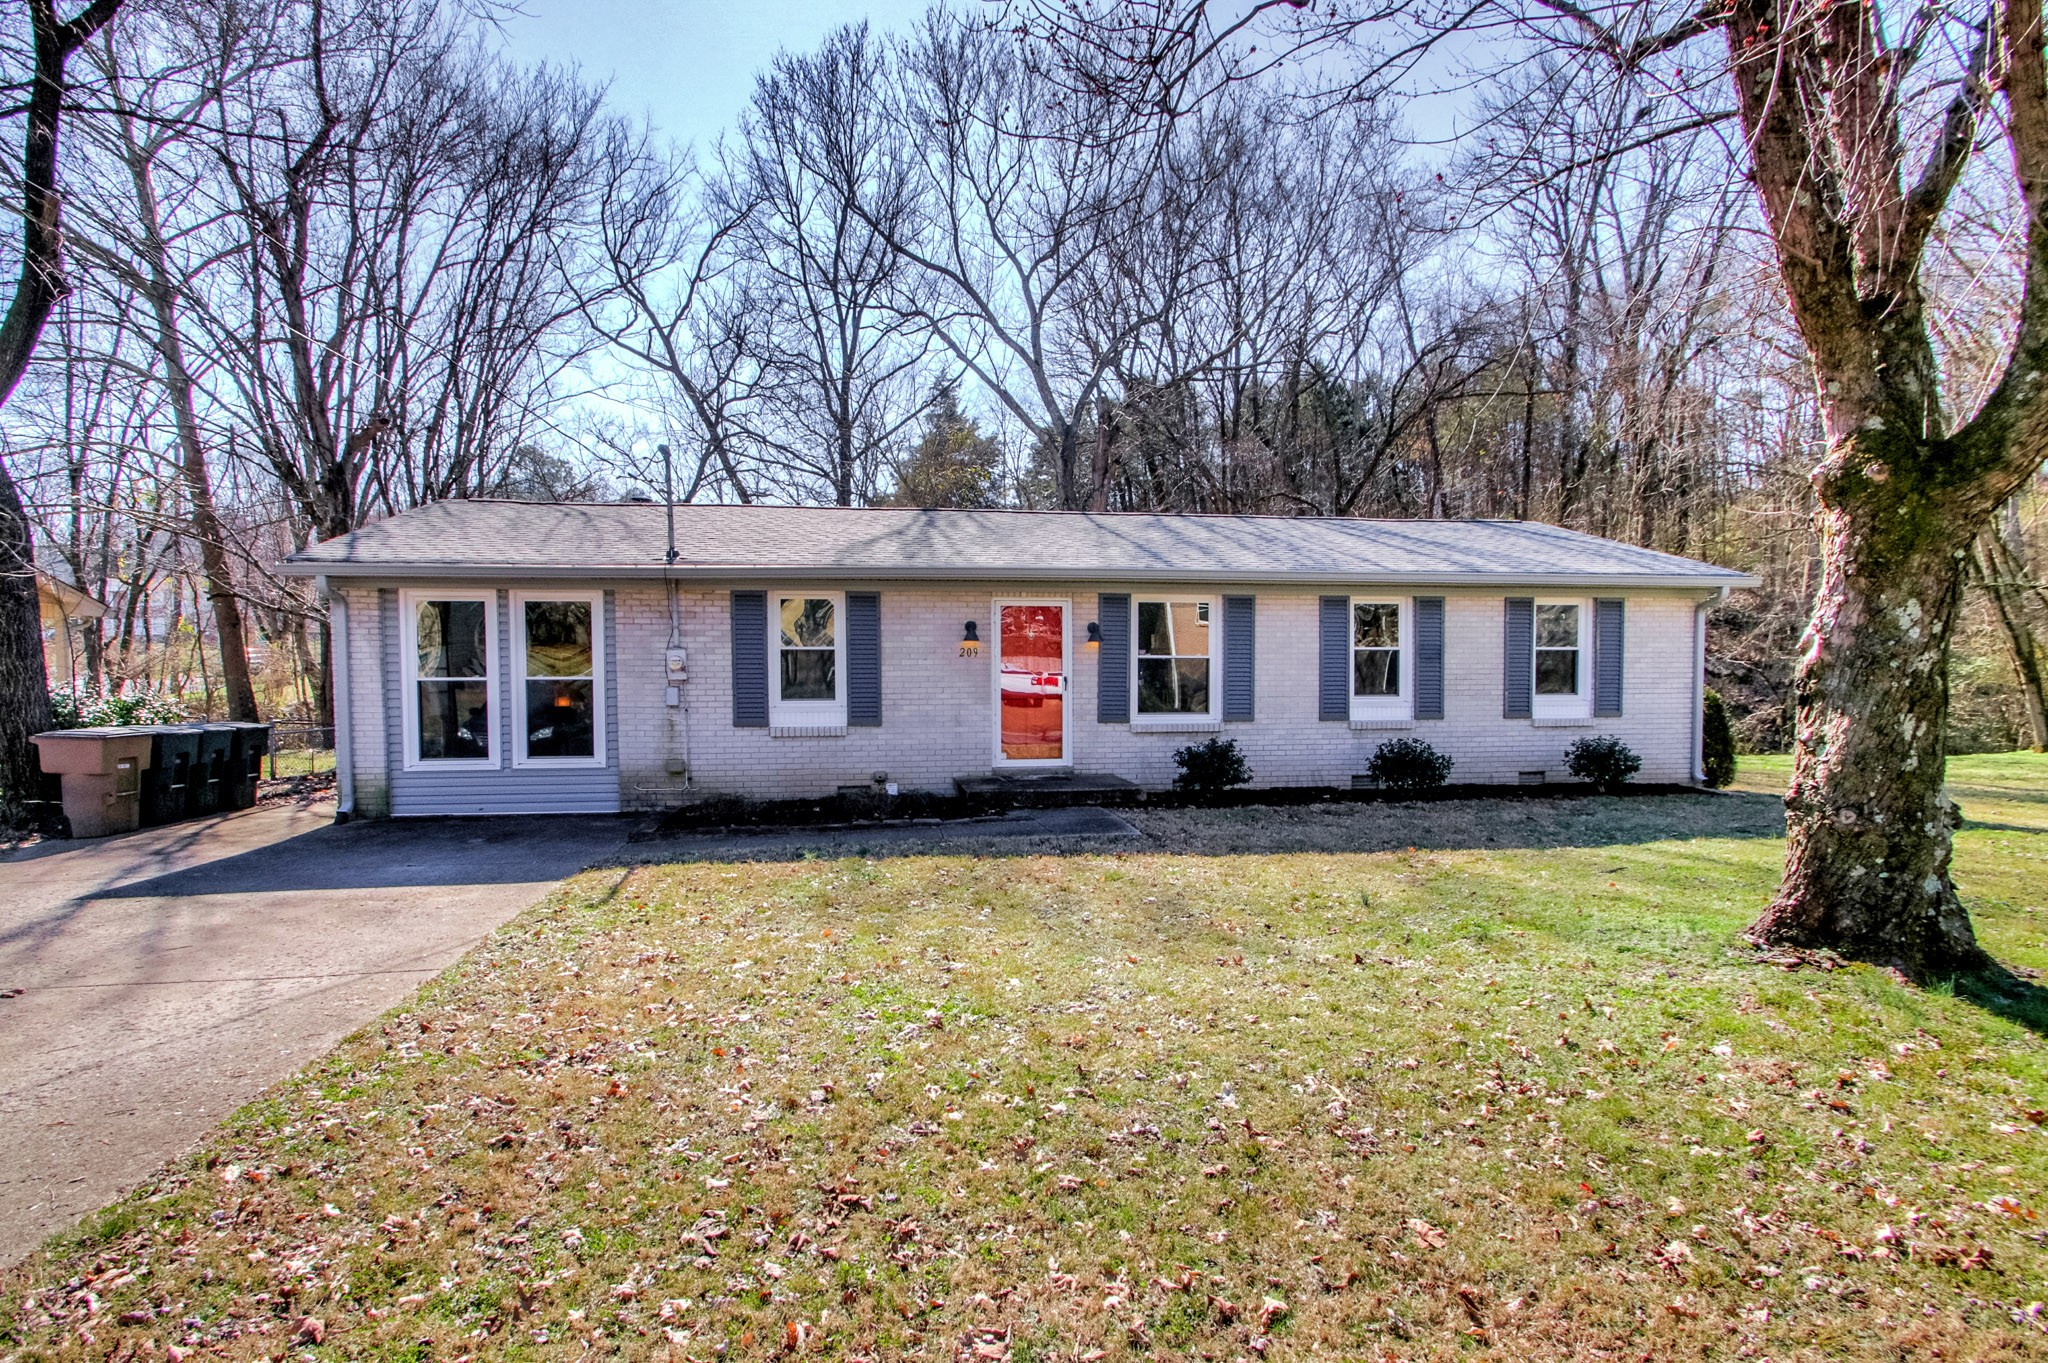 209 Ocala Dr, Nashville, TN 37211 - Nashville, TN real estate listing